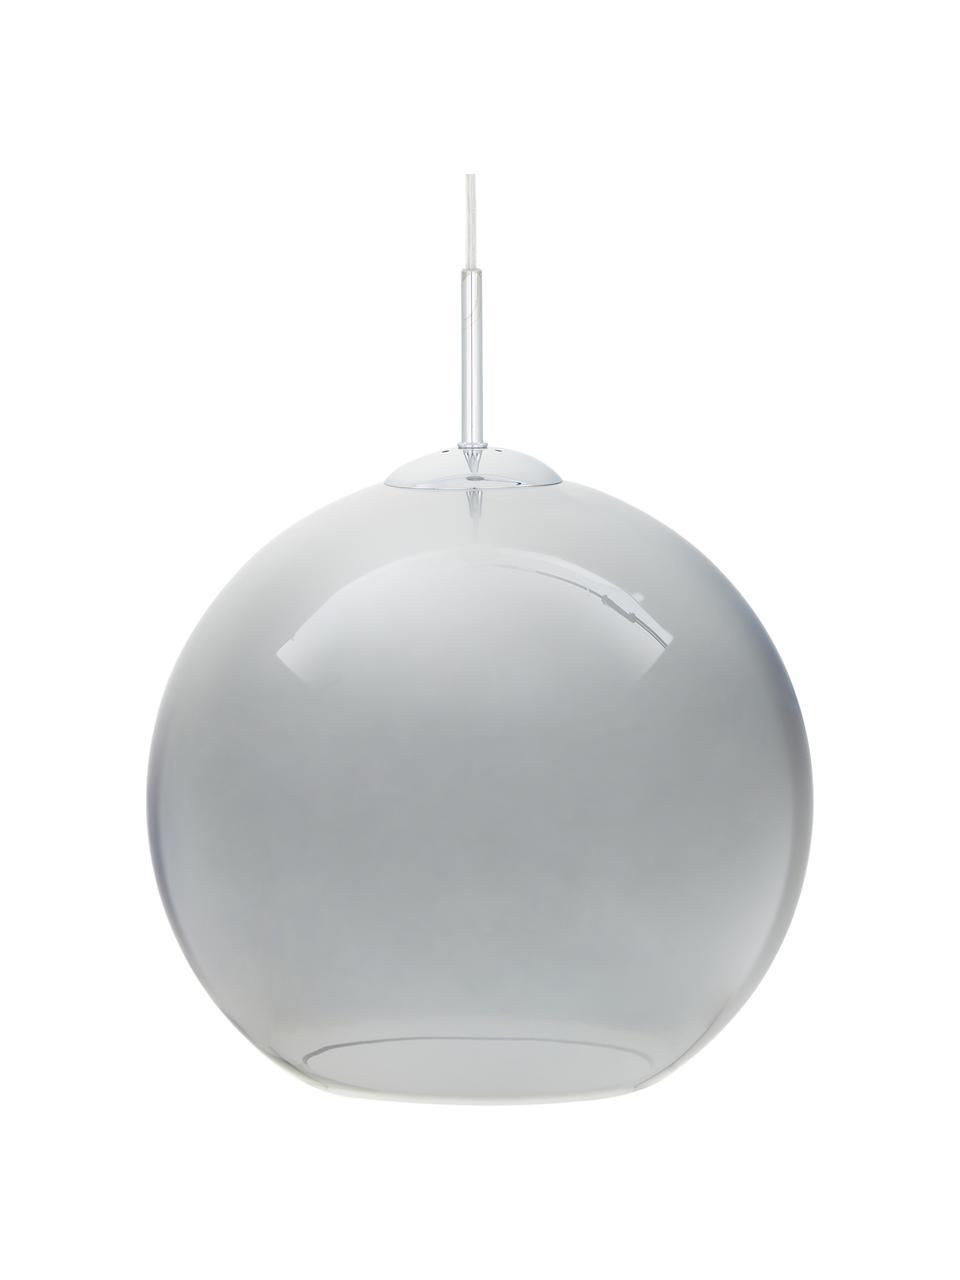 Pendelleuchte Silver aus verchromtem Glas, Baldachin: Metall, verchromt, Lampenschirm: Glas, Chrom, Grau, Ø 30 cm